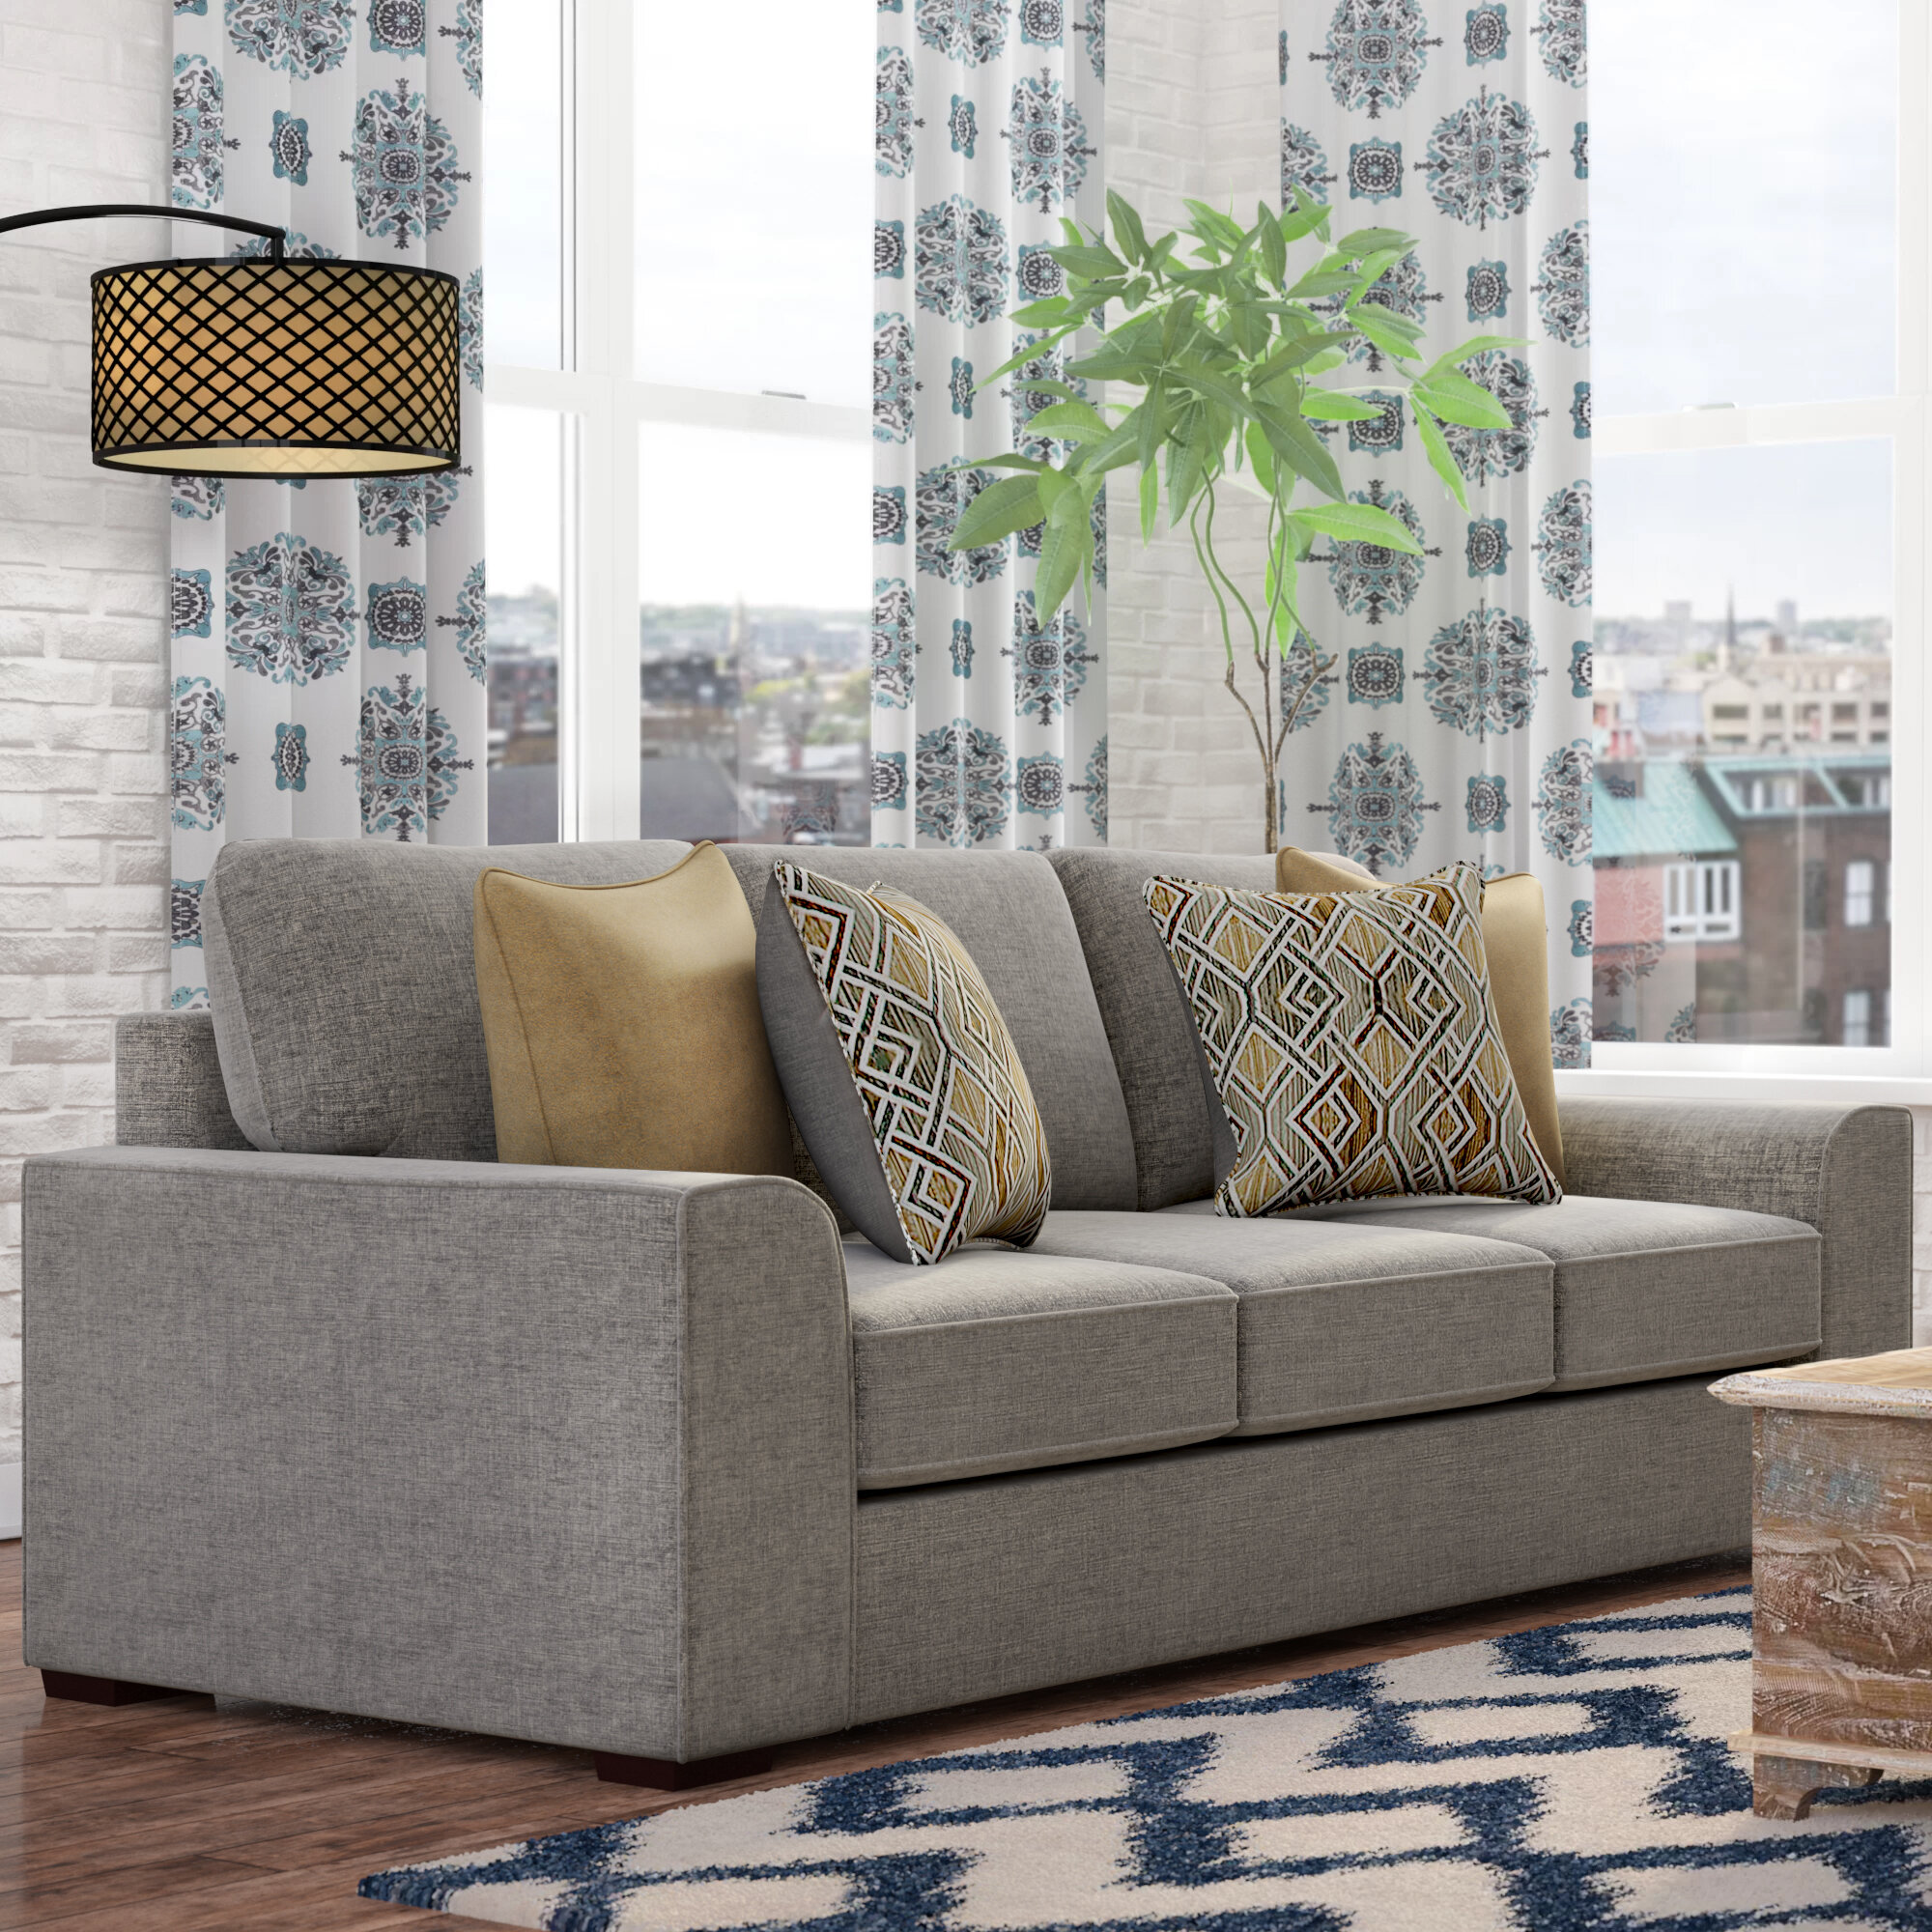 Zipcode Design Ackers Brook Sofa By Simmons Upholstery Reviews Wayfair